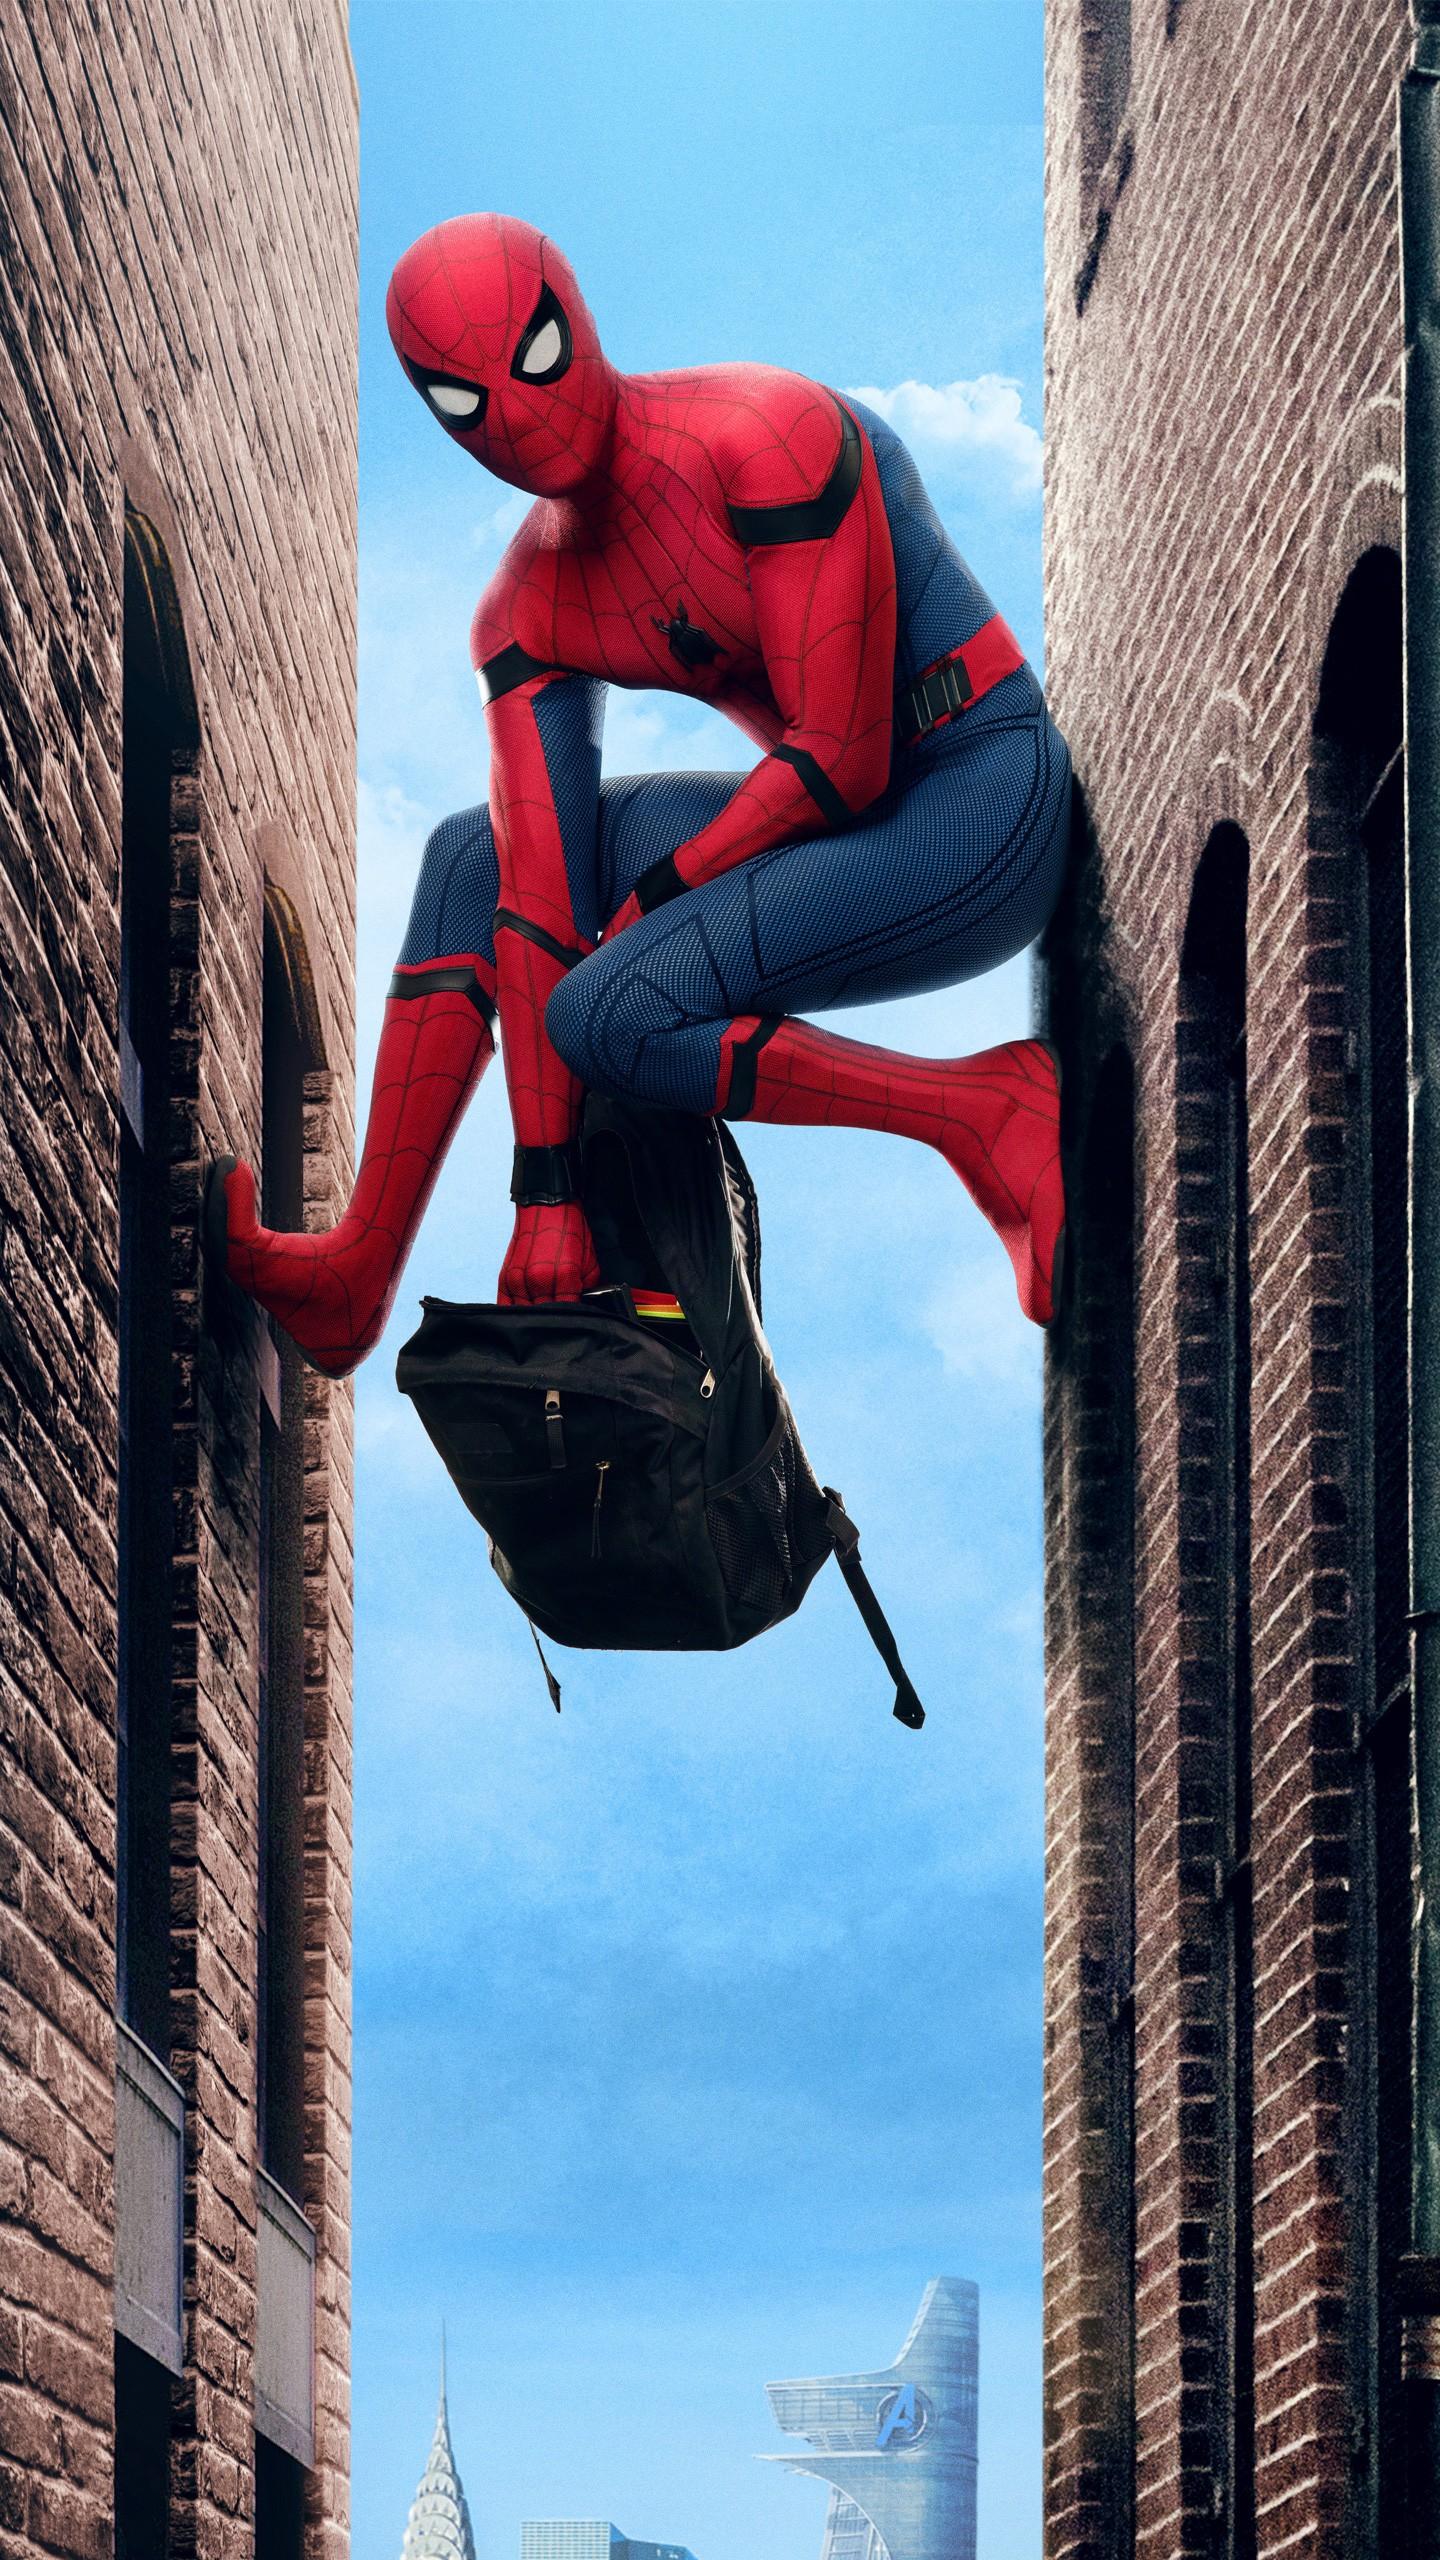 Wallpaper Hd 4k Android Spider Man Homecoming Hd Wallpapers Hd Wallpapers Id